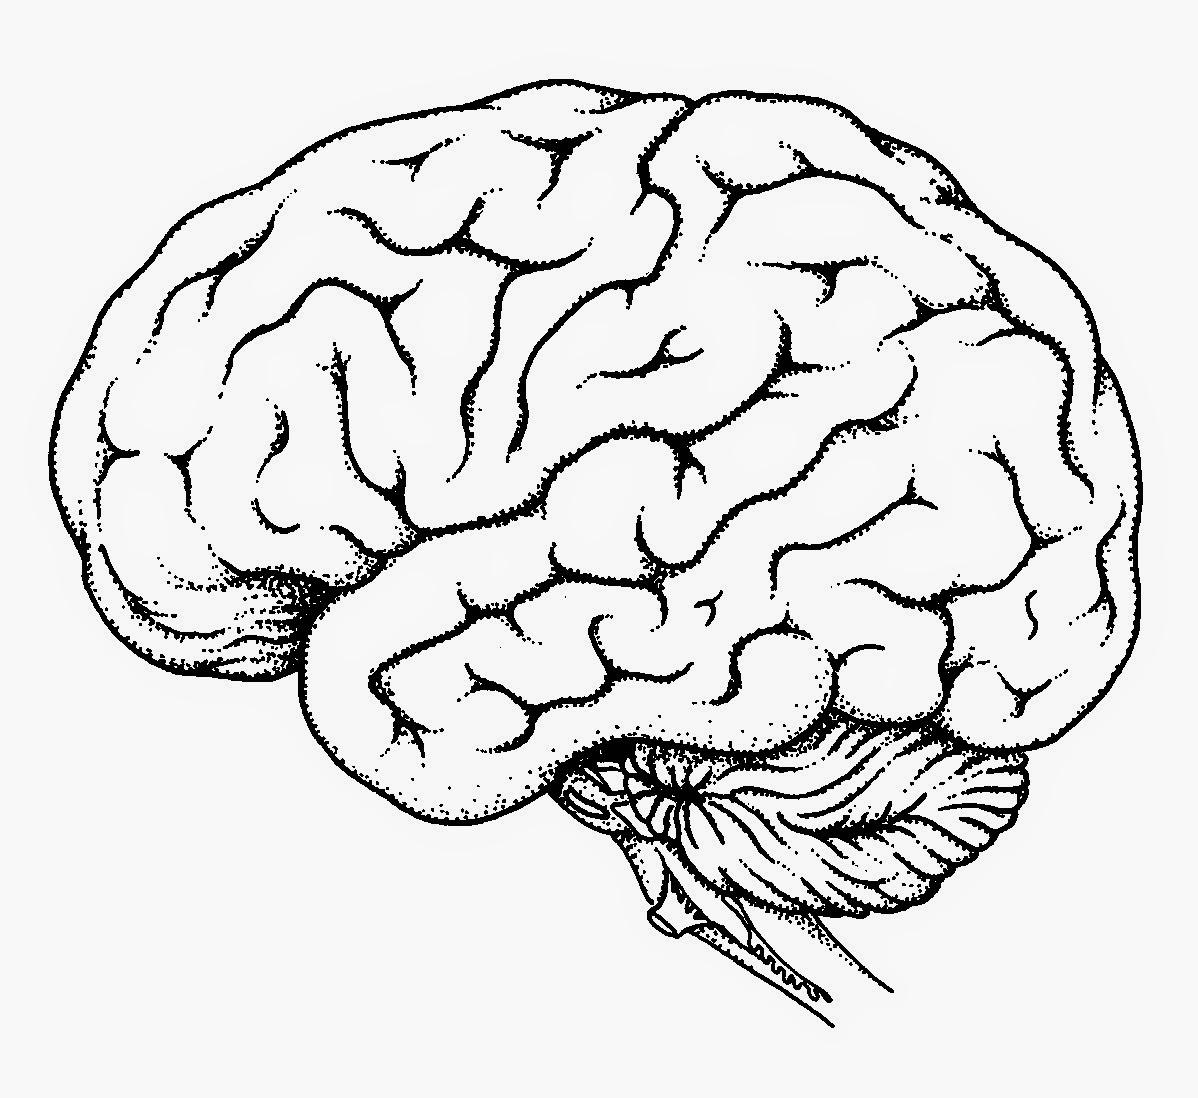 easy brain diagram mazda 6 wiring 2006 human drawing at getdrawings free for personal